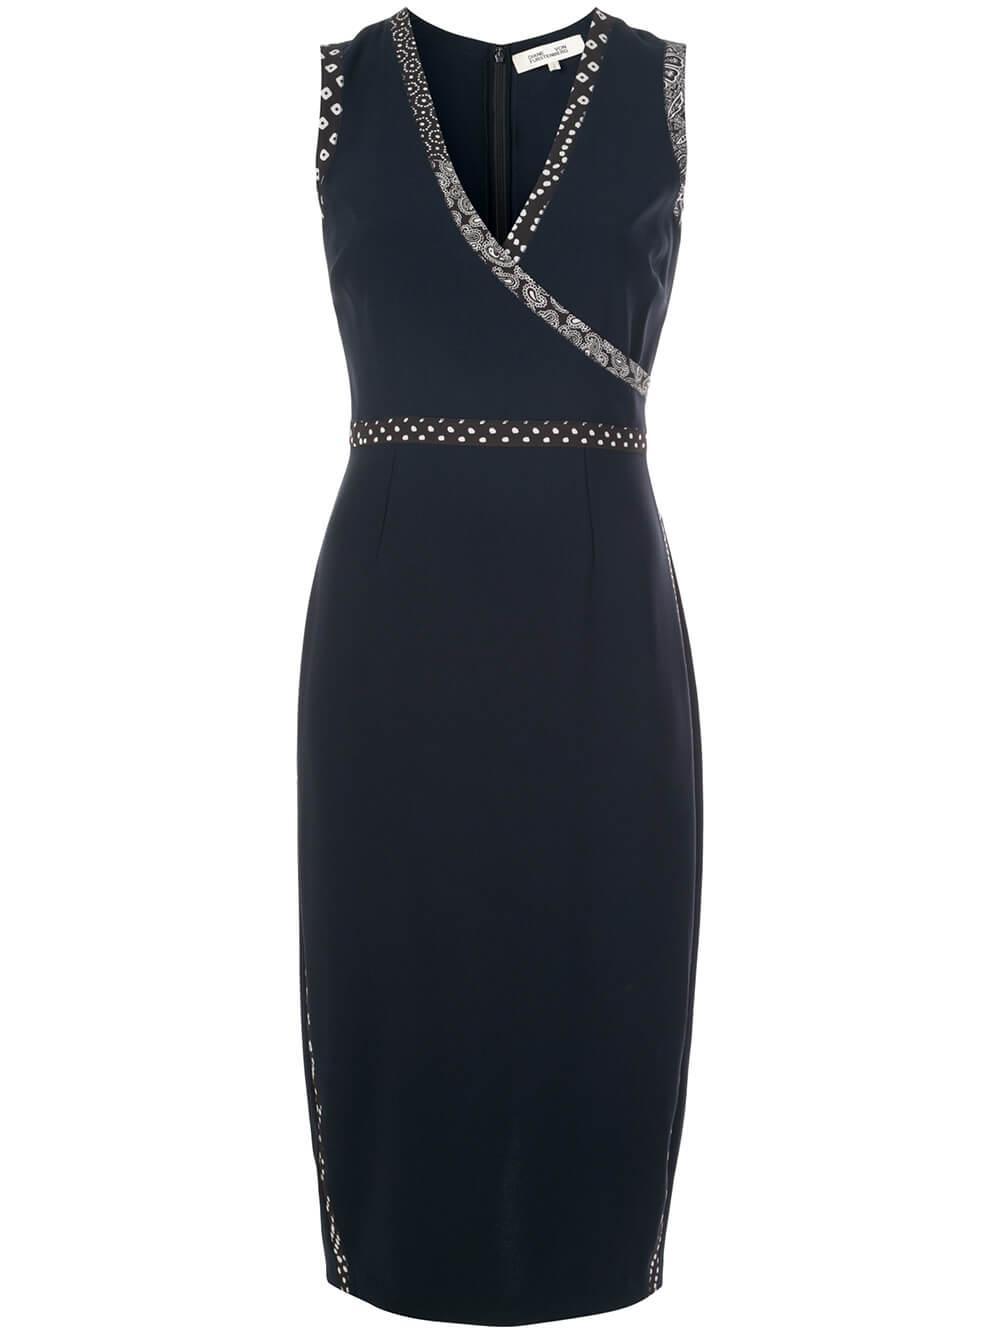 Anissa Sleeveless Sheath Dress Item # 14208DVF